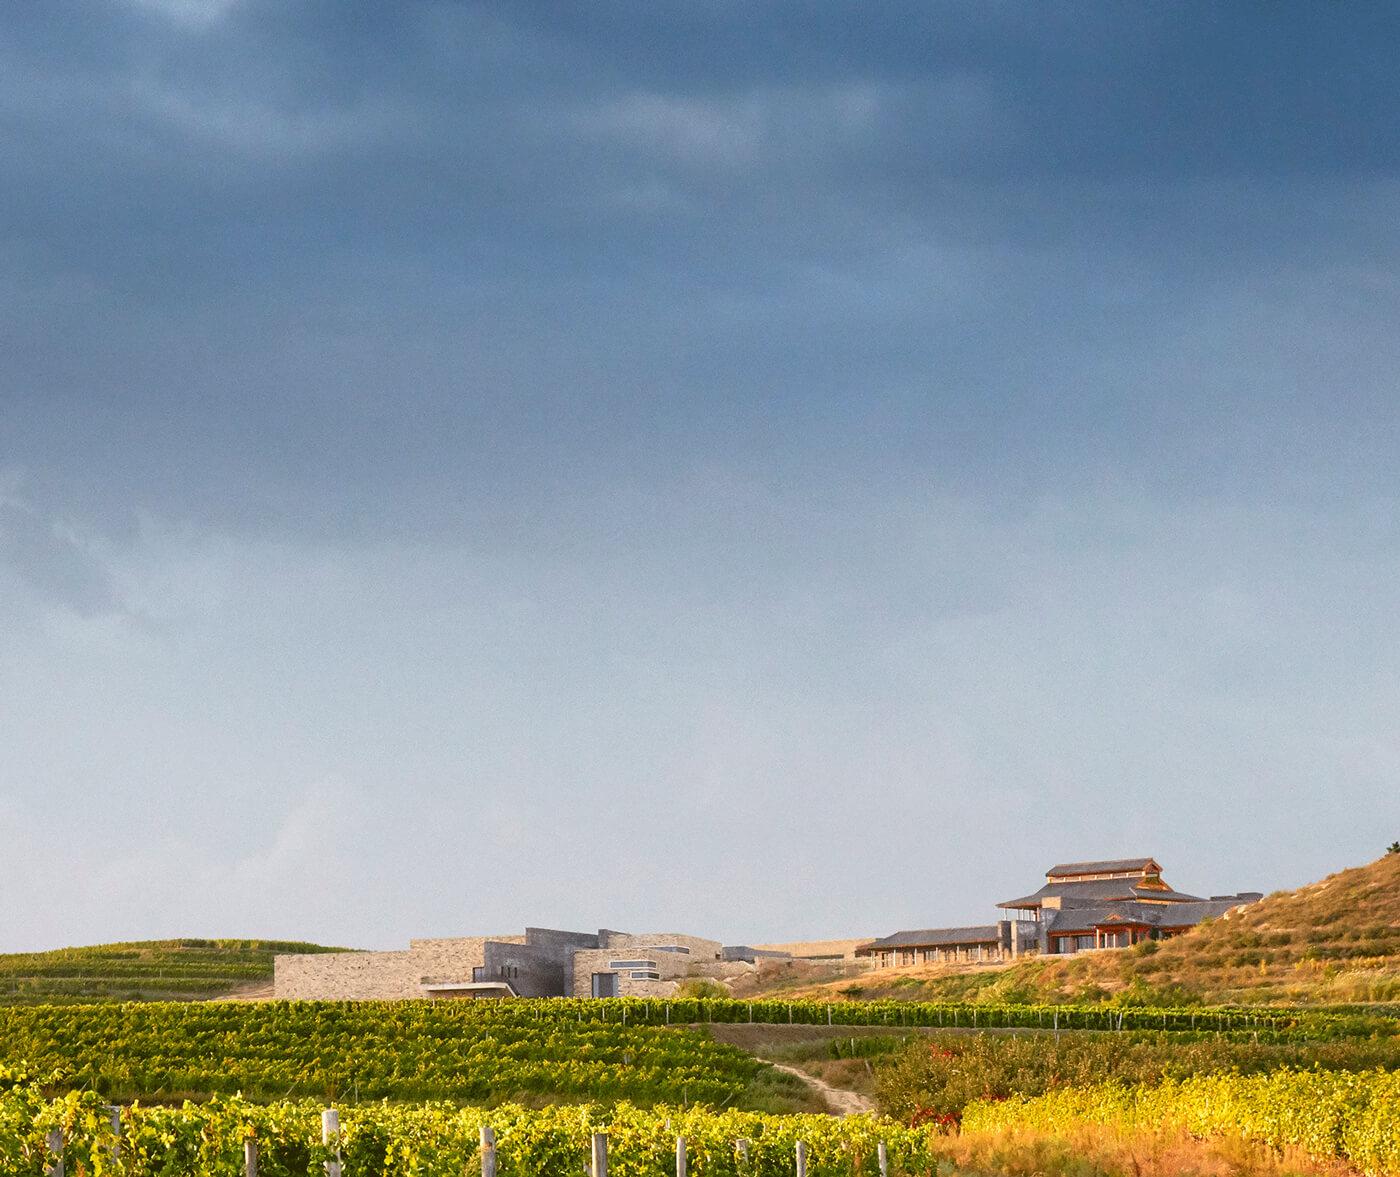 domaine-de-long-dai in China's Penglai - Yantai wine region